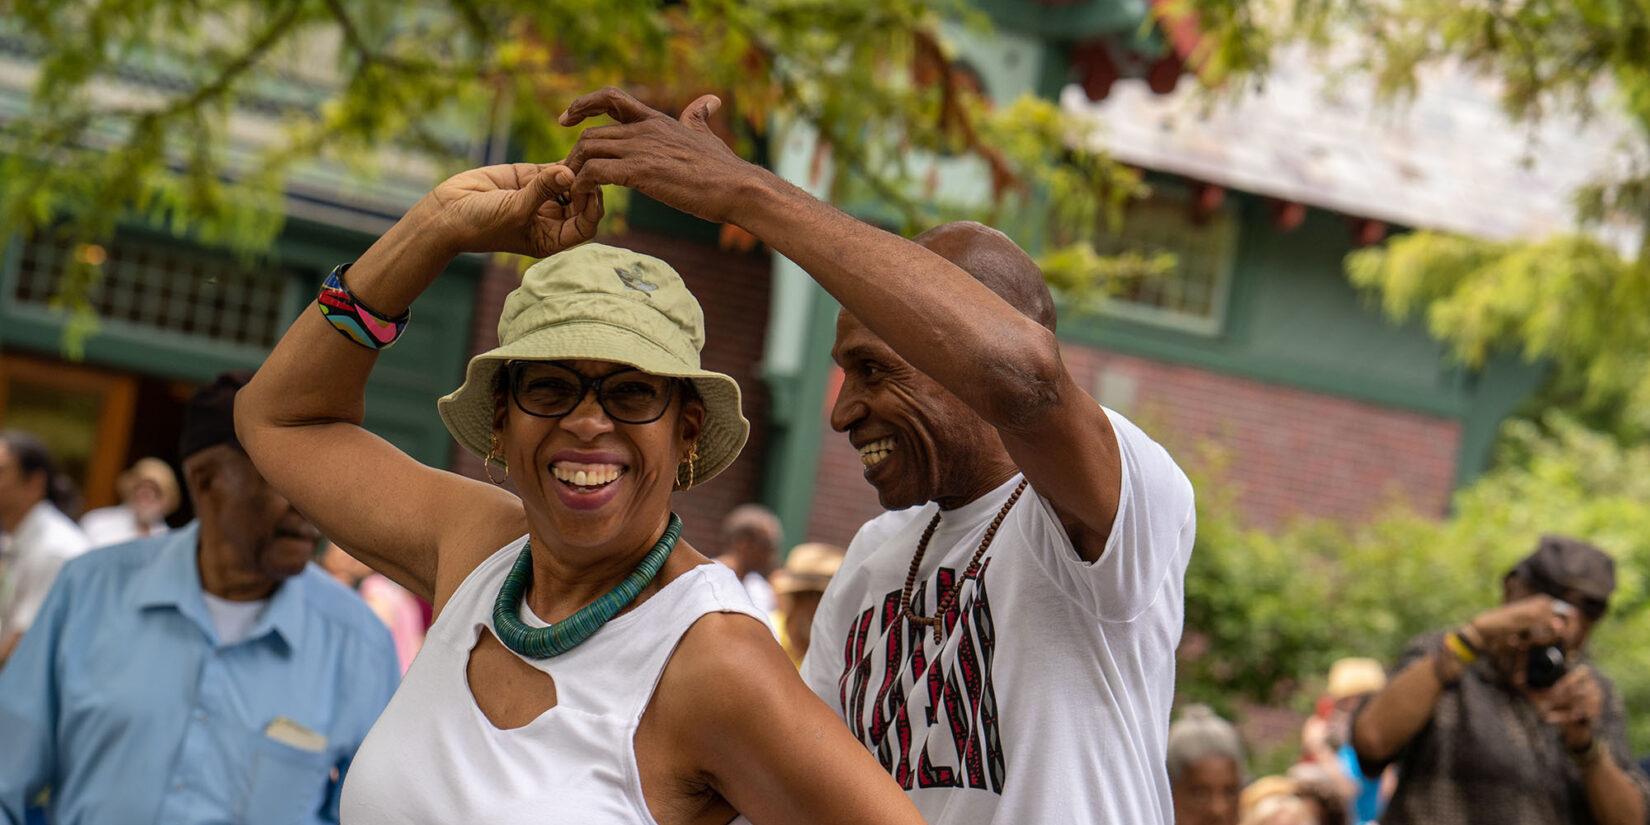 Two older dancers enjoying the rhythms of the festival